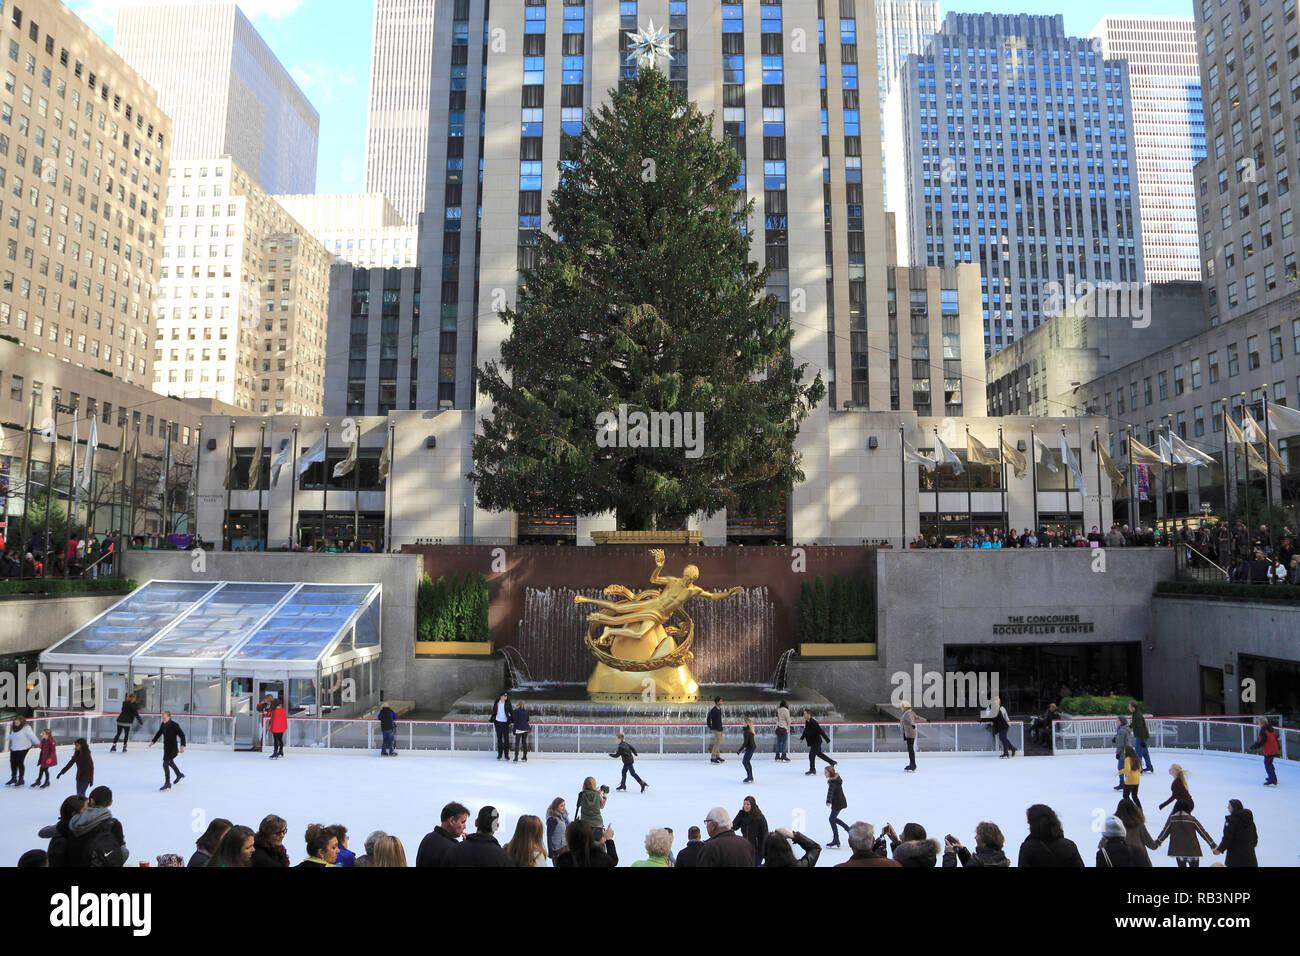 Weihnachtsbaum Rockefeller Center.Rockefeller Center Christmas Tree Stock Photos Rockefeller Center